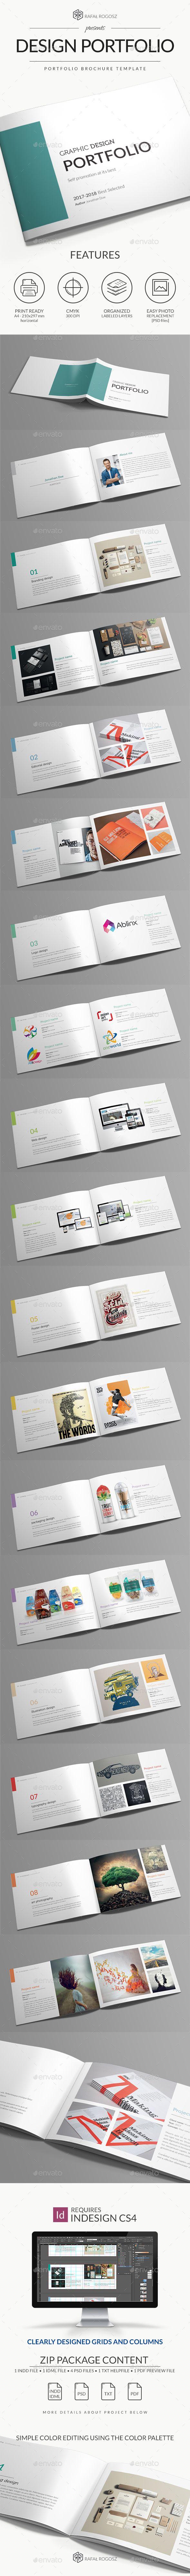 #Graphic Design Portfolio Brocure A4 - Portfolio #Brochures Download here:  https://graphicriver.net/item/graphic-design-portfolio-brocure-a4/20303211?ref=alena994